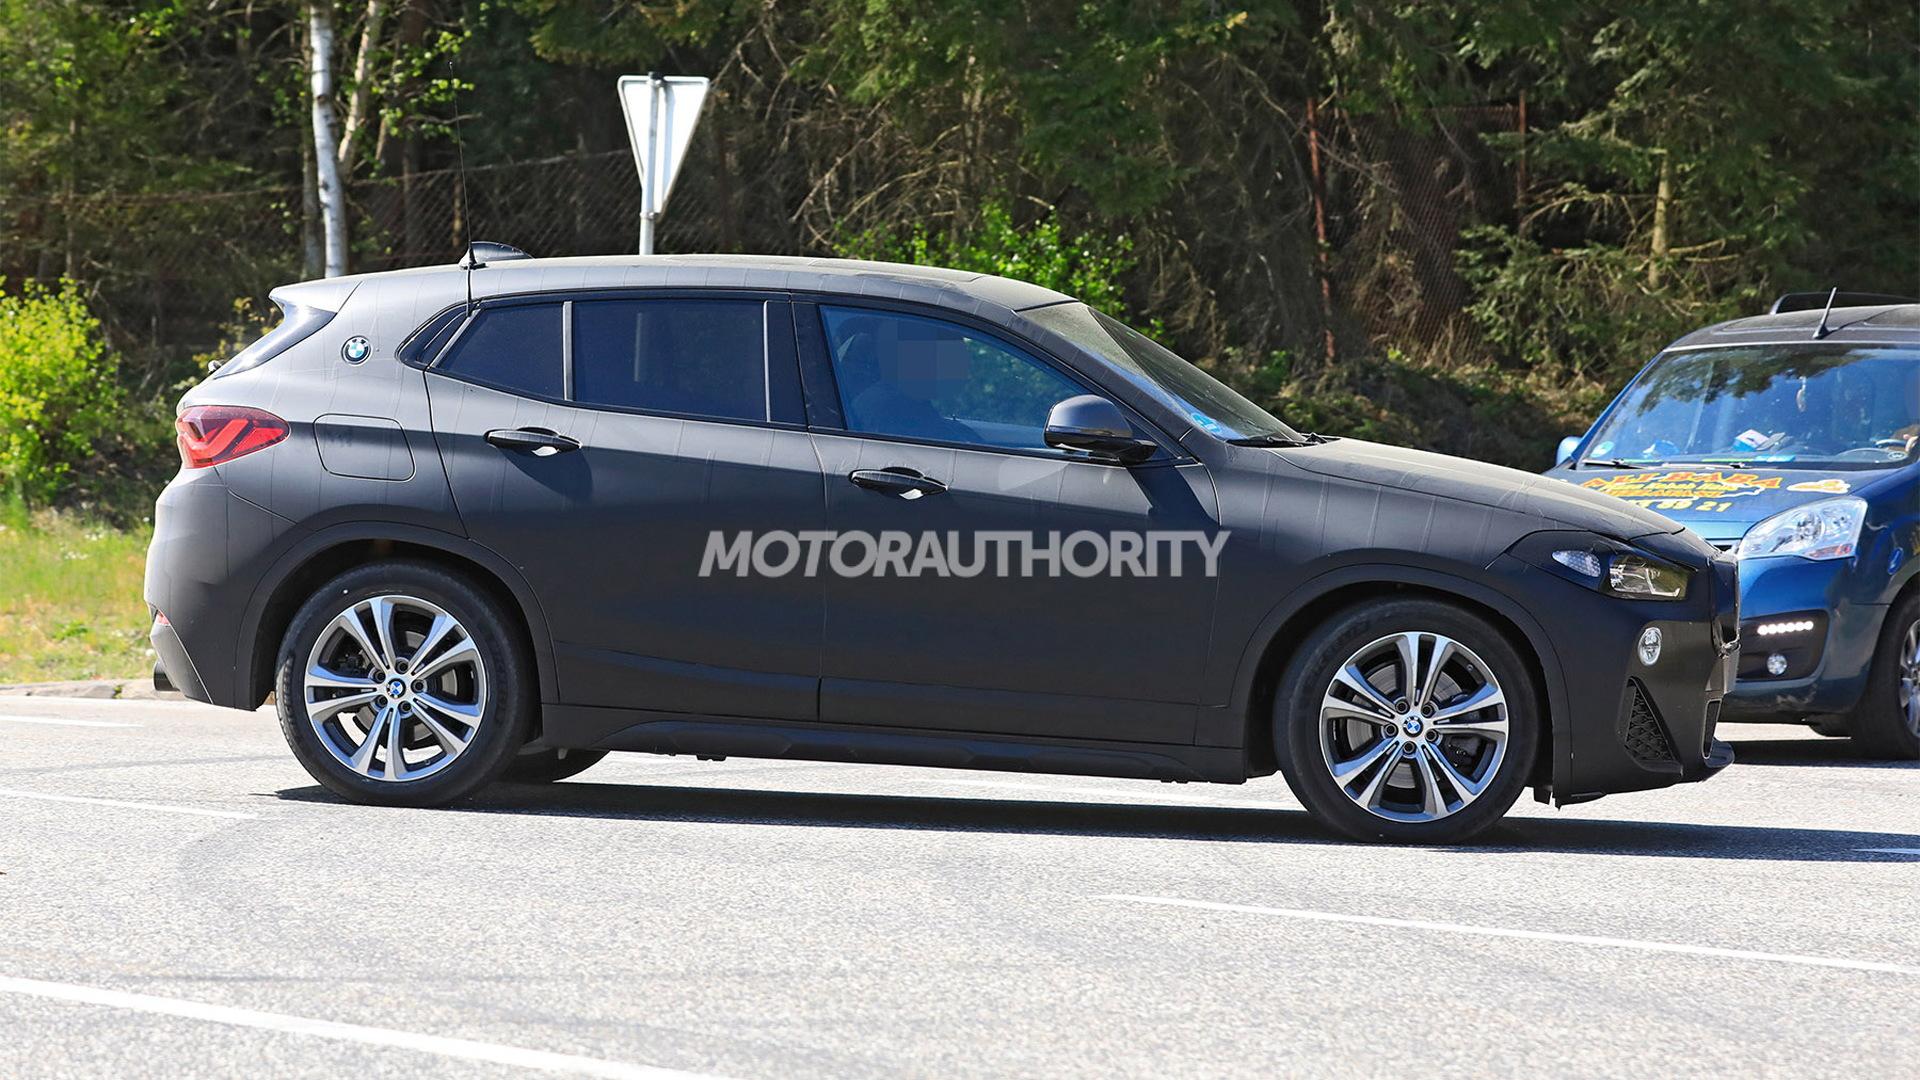 2022 BMW X2 facelift spy shots - Photo credit:S. Baldauf/SB-Medien